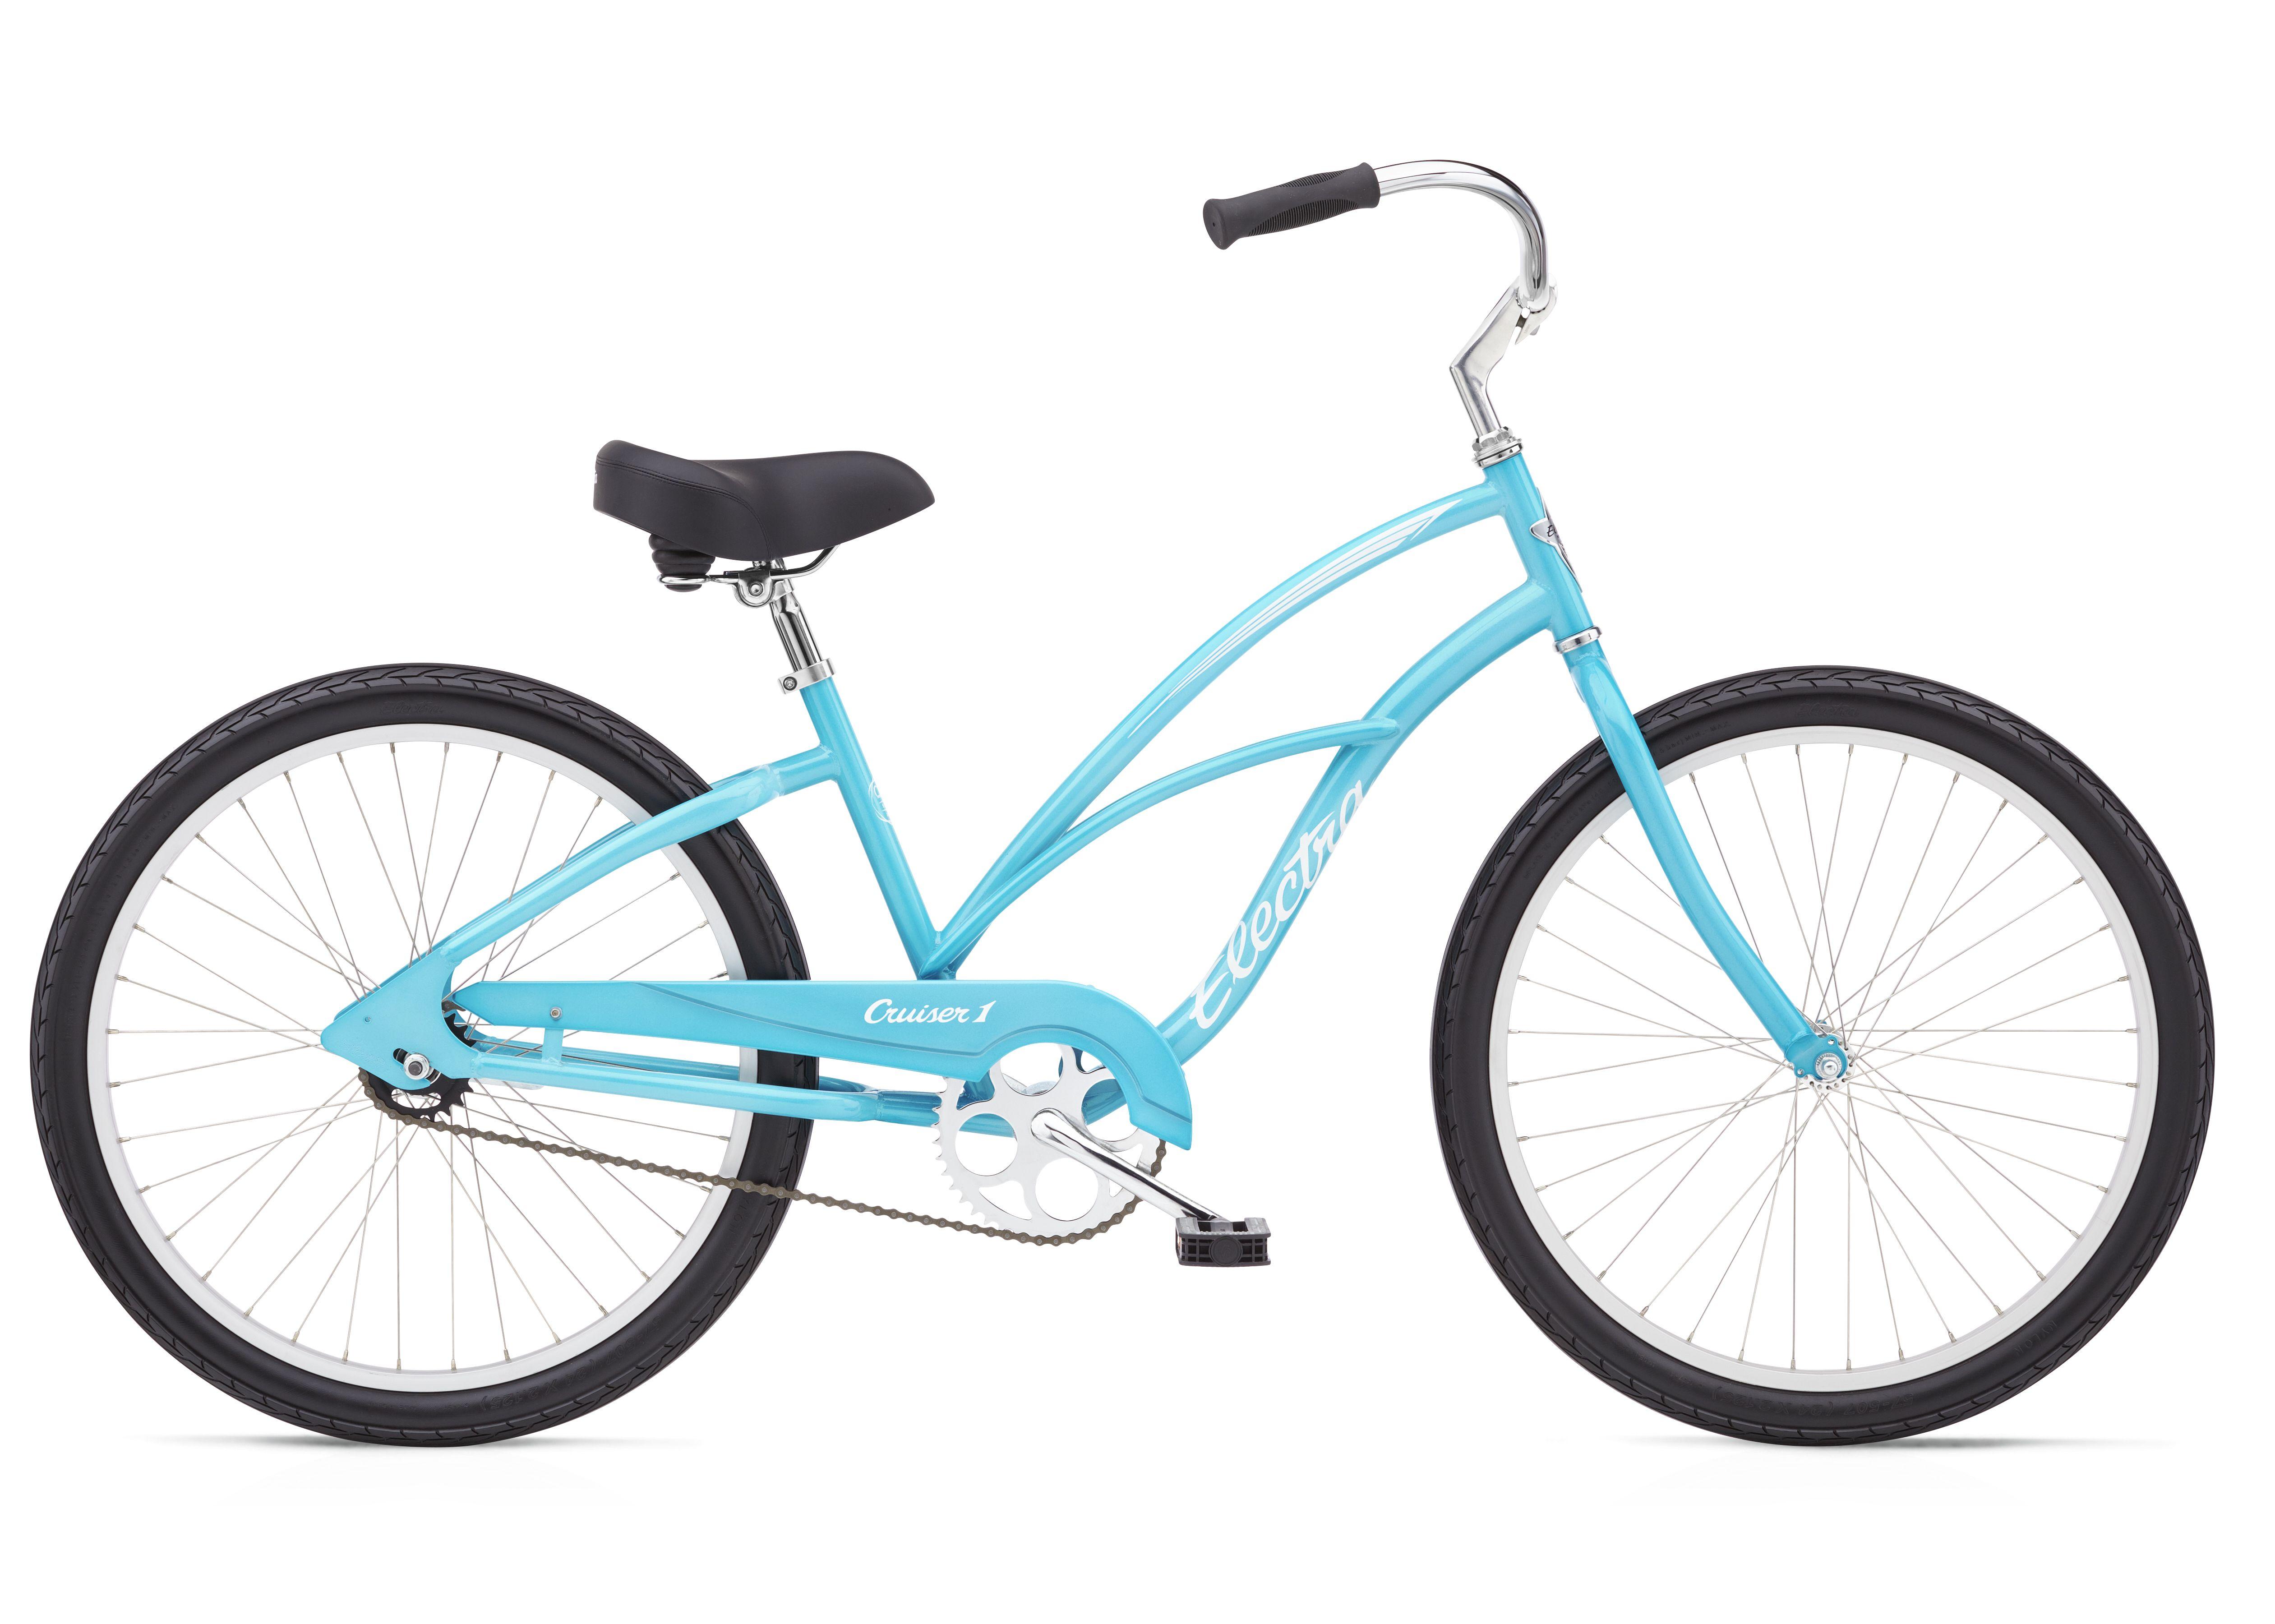 Electra Ladies Cruiser 1 24in In Bora Bora Blue In 2020 Electra Bike Cruiser Bike Beach Cruiser